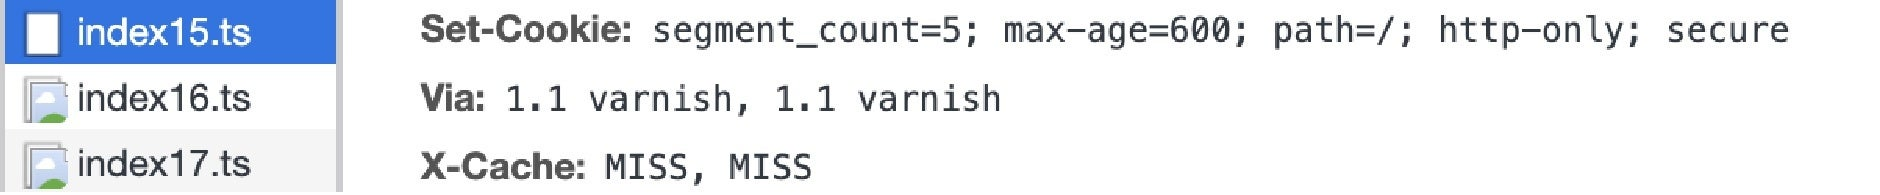 Segment Count 5